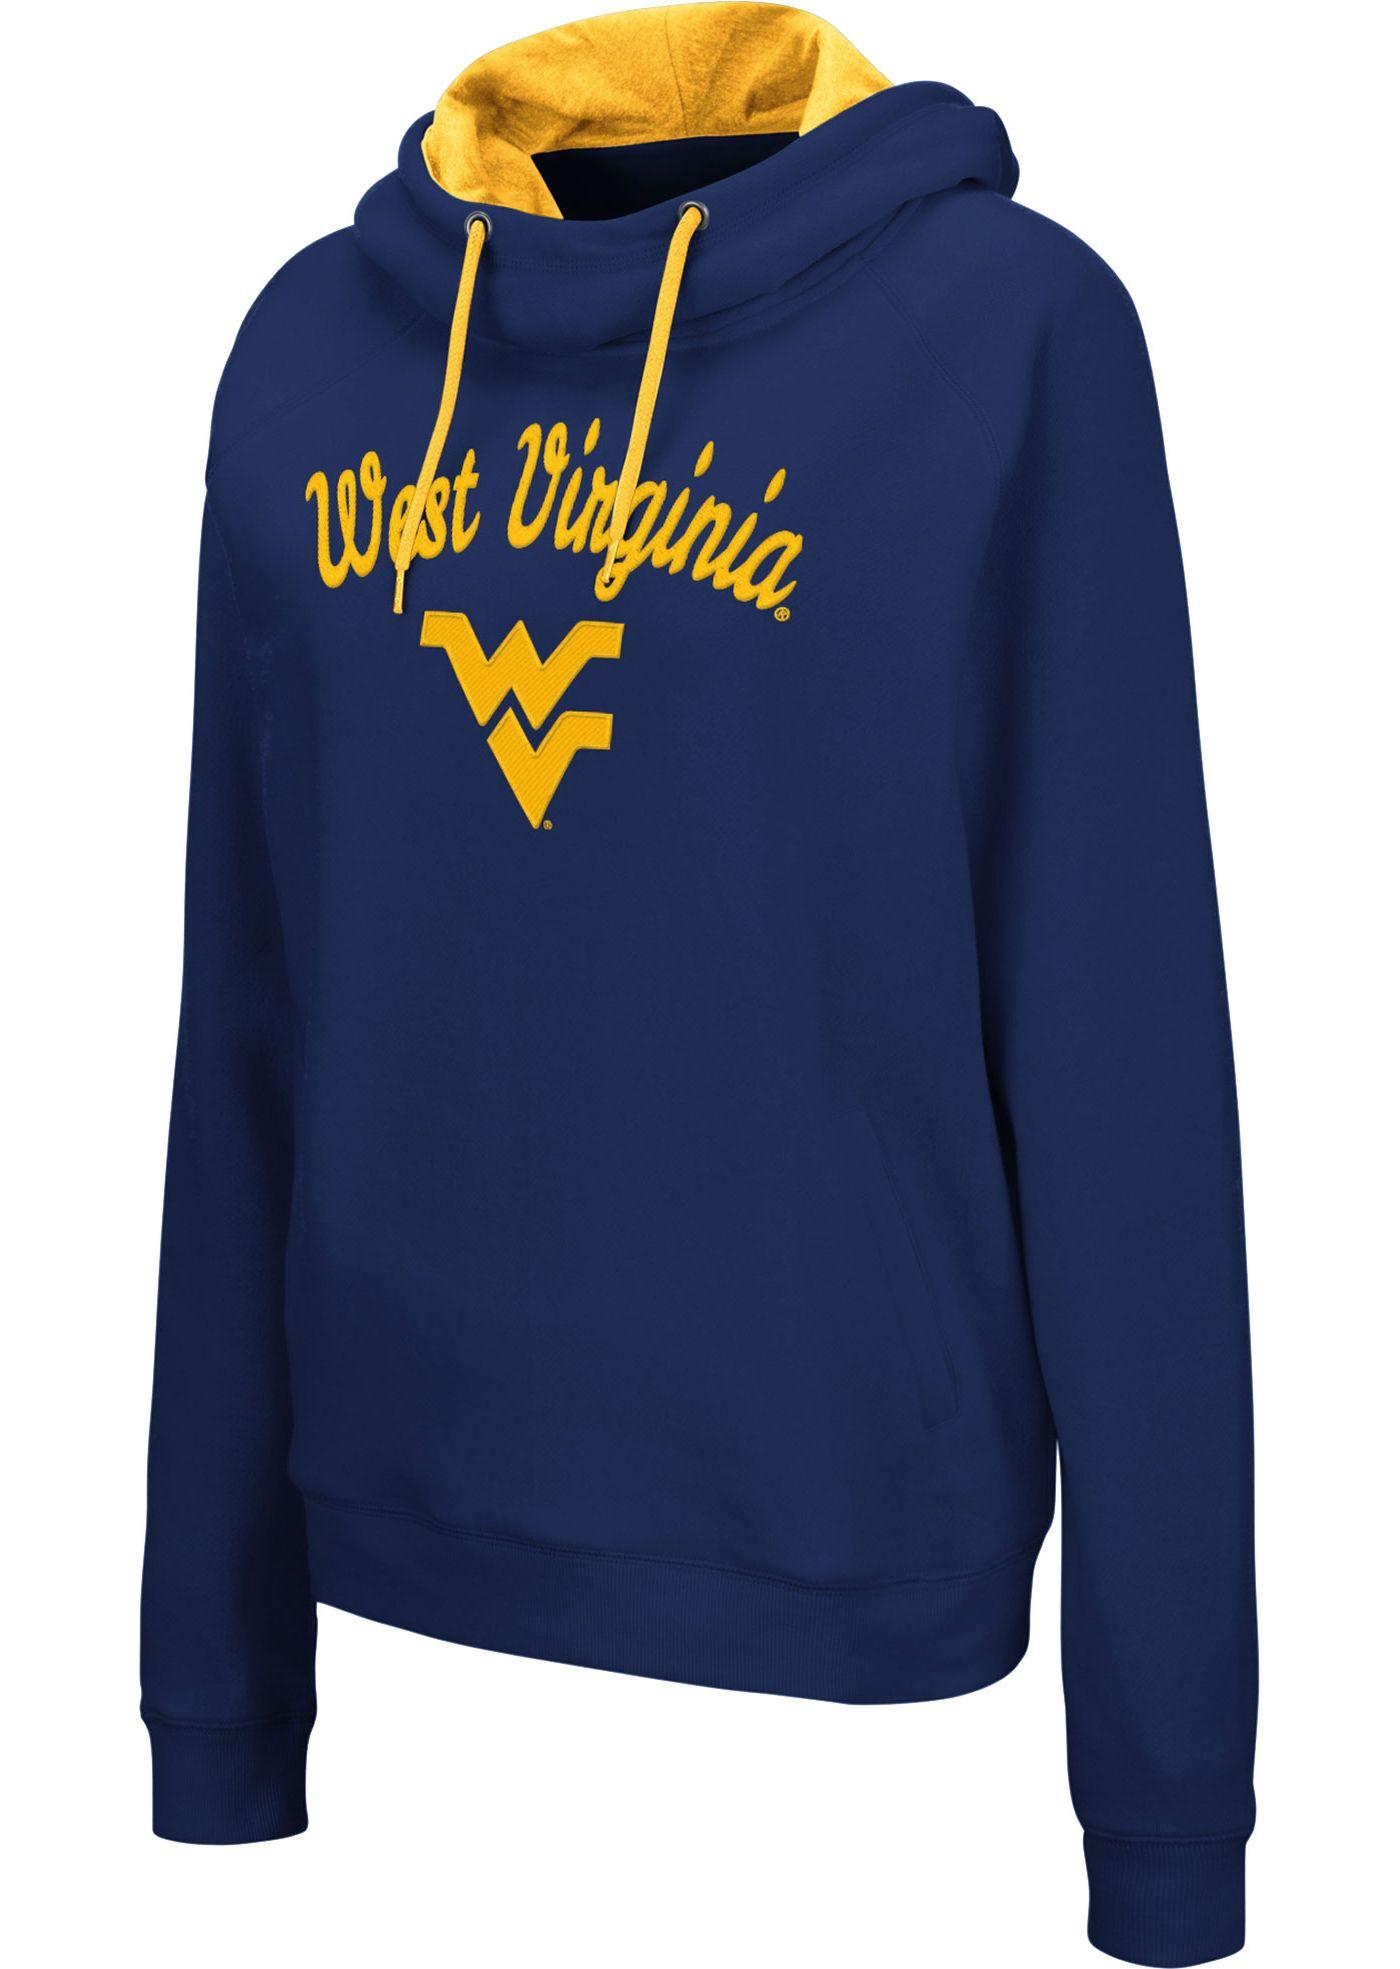 Colosseum Women's West Virginia Mountaineers Blue Louise Pullover Sweatshirt